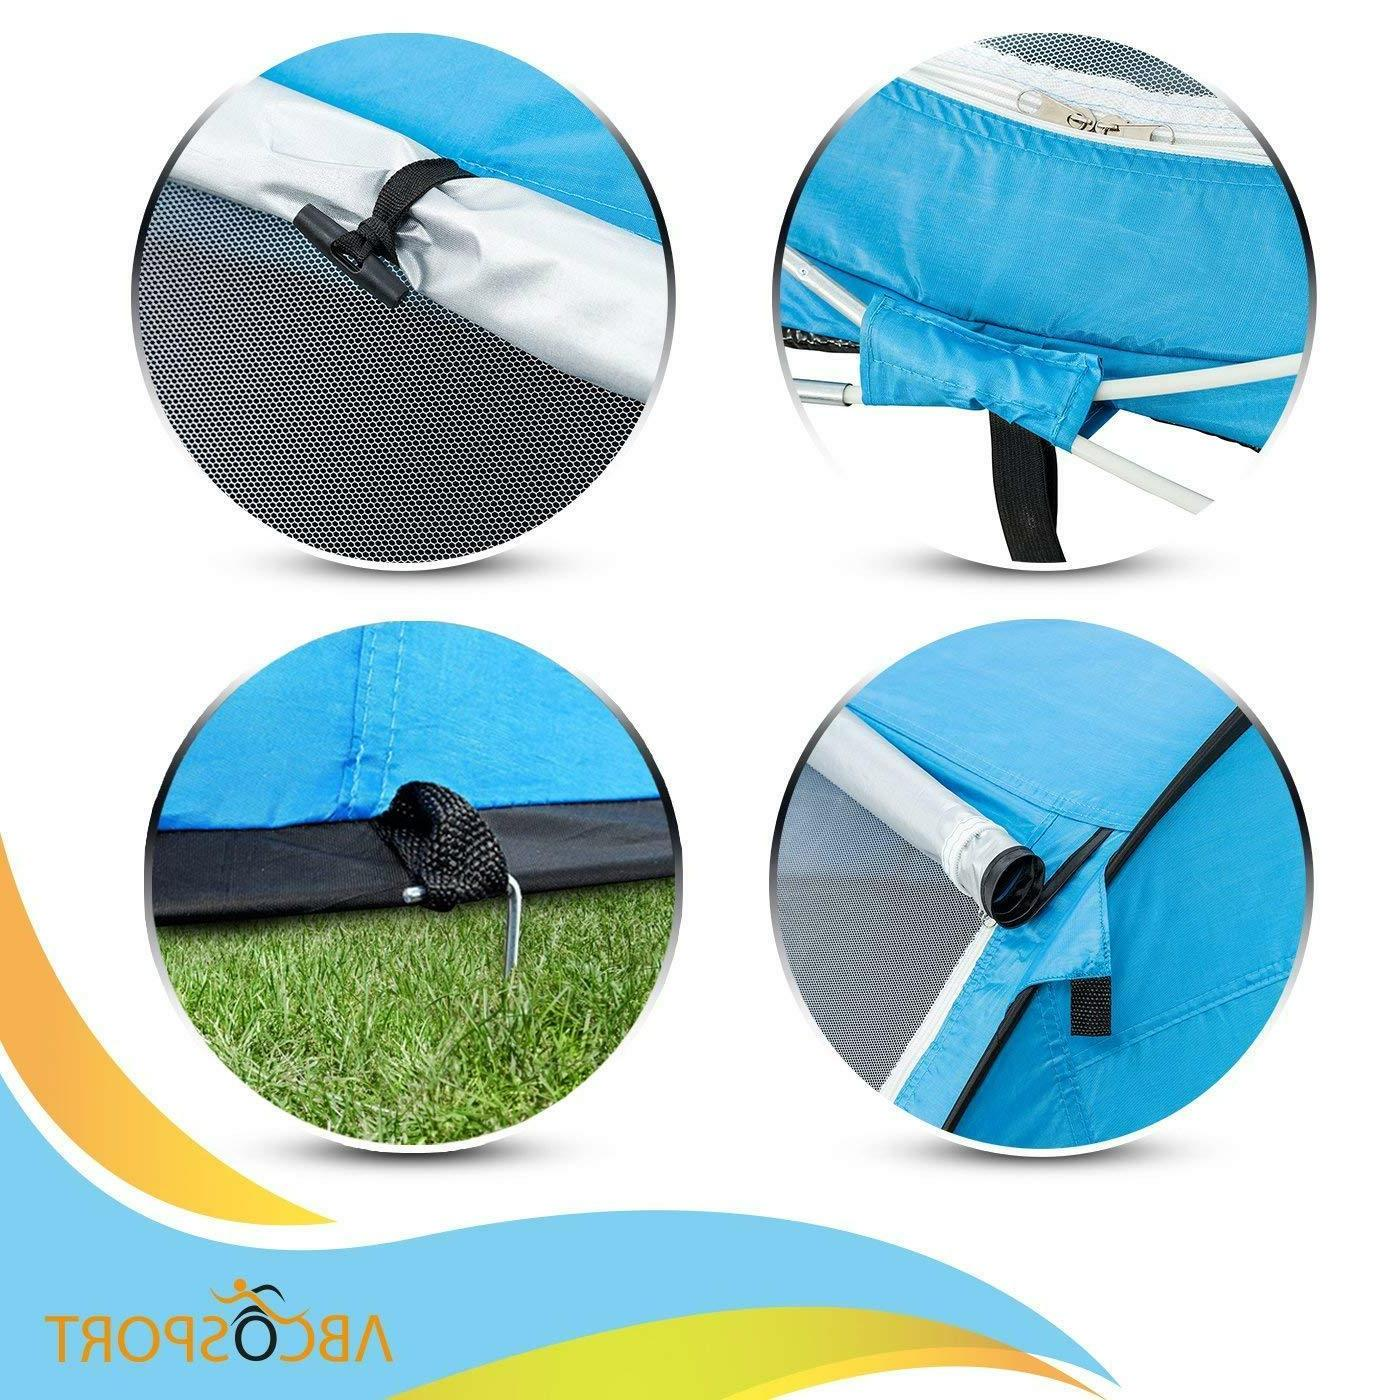 Pop-up Instant Portable Beach Tent - Suitable for 2